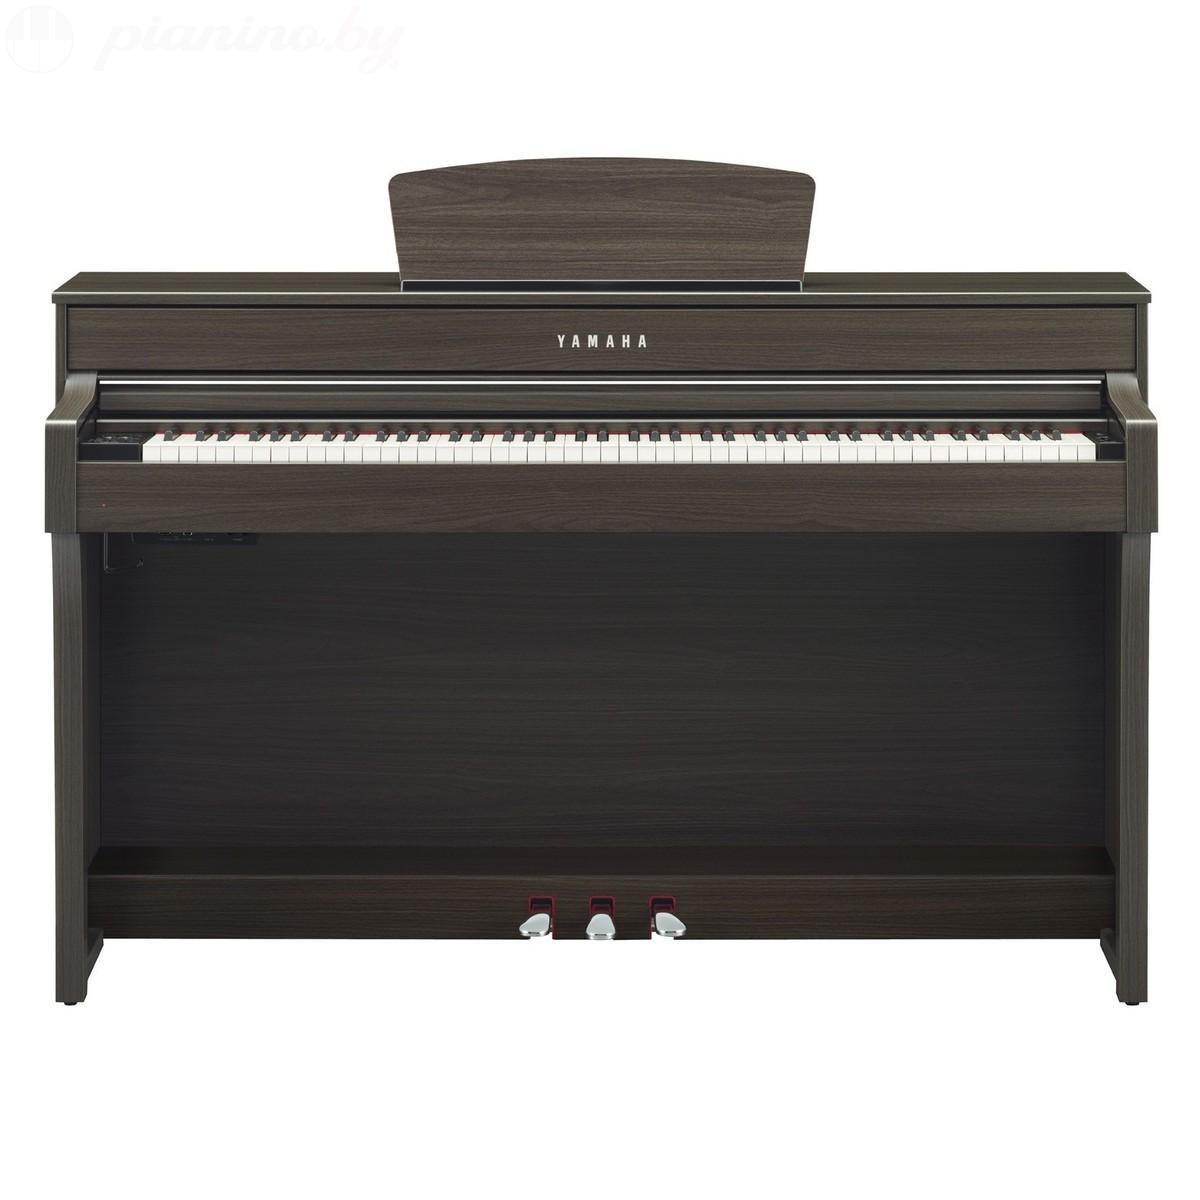 Цифровое пианино Yamaha Clavinova CLP-635 Dark Walnut (CLP635DW) Фото 2